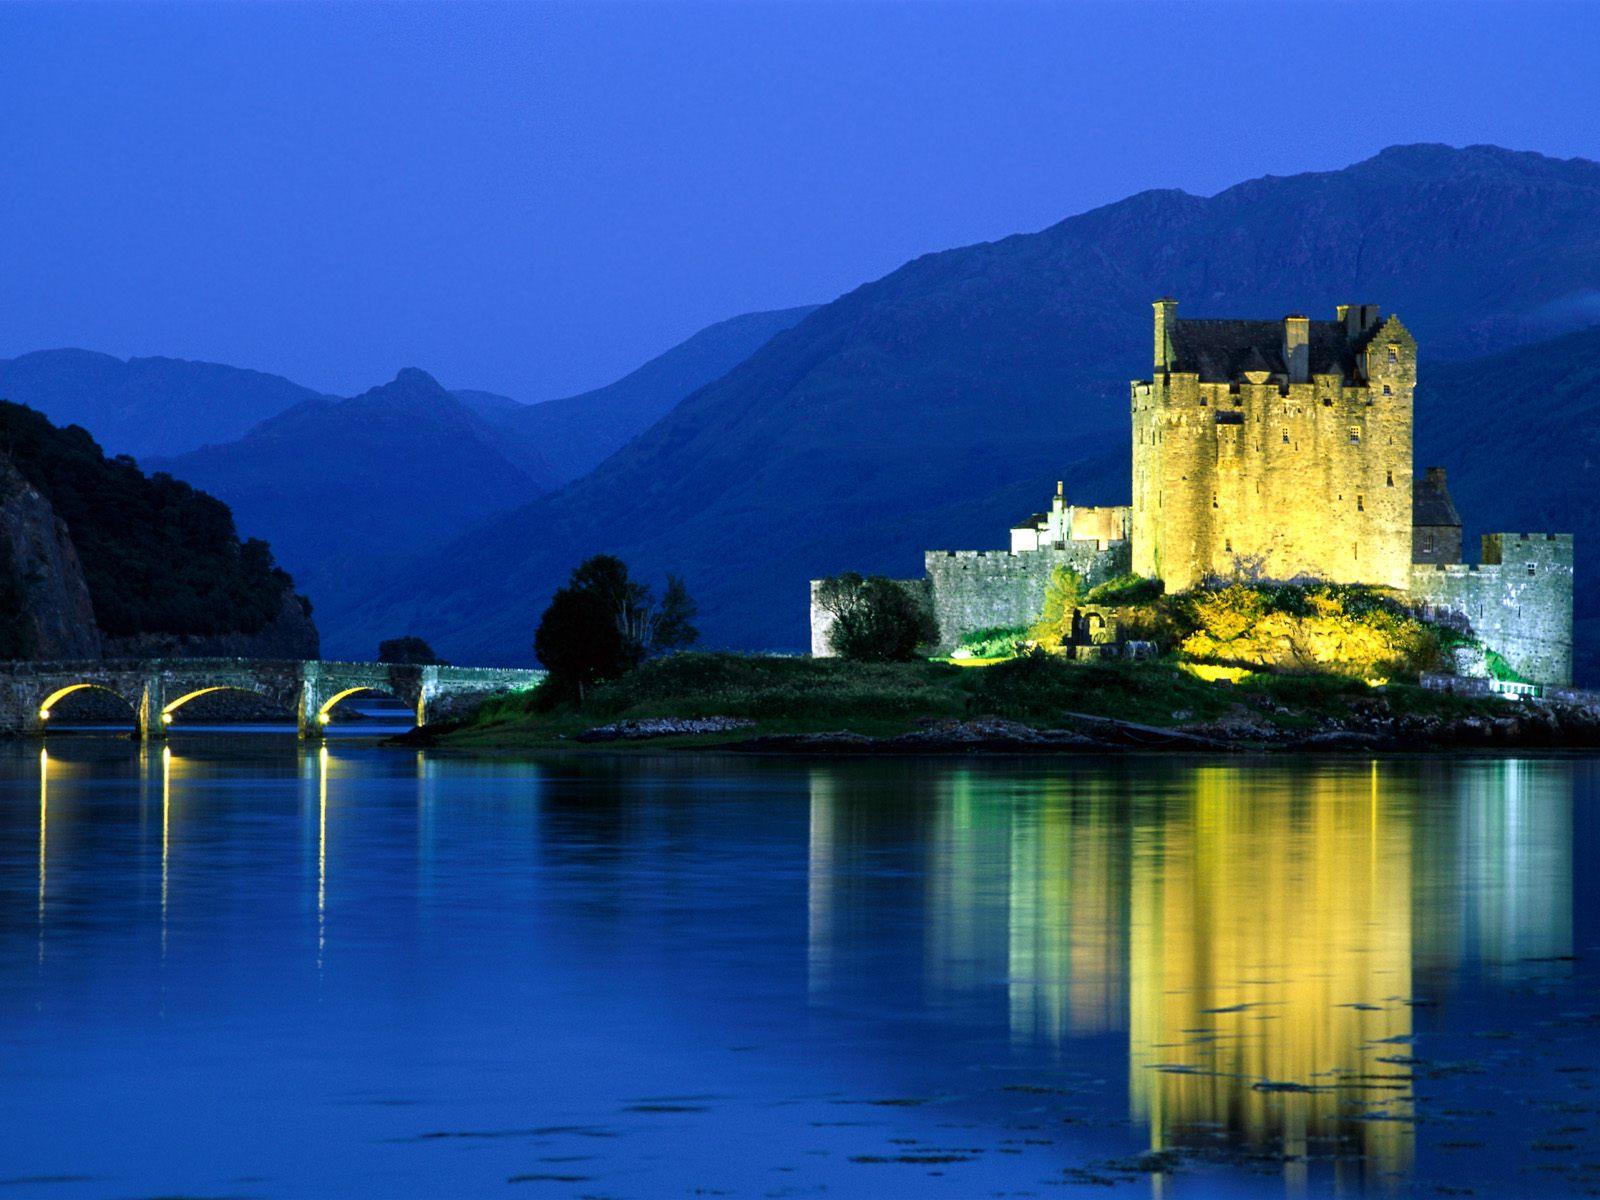 http://2.bp.blogspot.com/_mmBw3uzPnJI/TO6n2_1ComI/AAAAAAABxe4/vctKZAe78fE/s1600/Eilean-Donan-Castle-Loch-Duich-Scotland.jpg